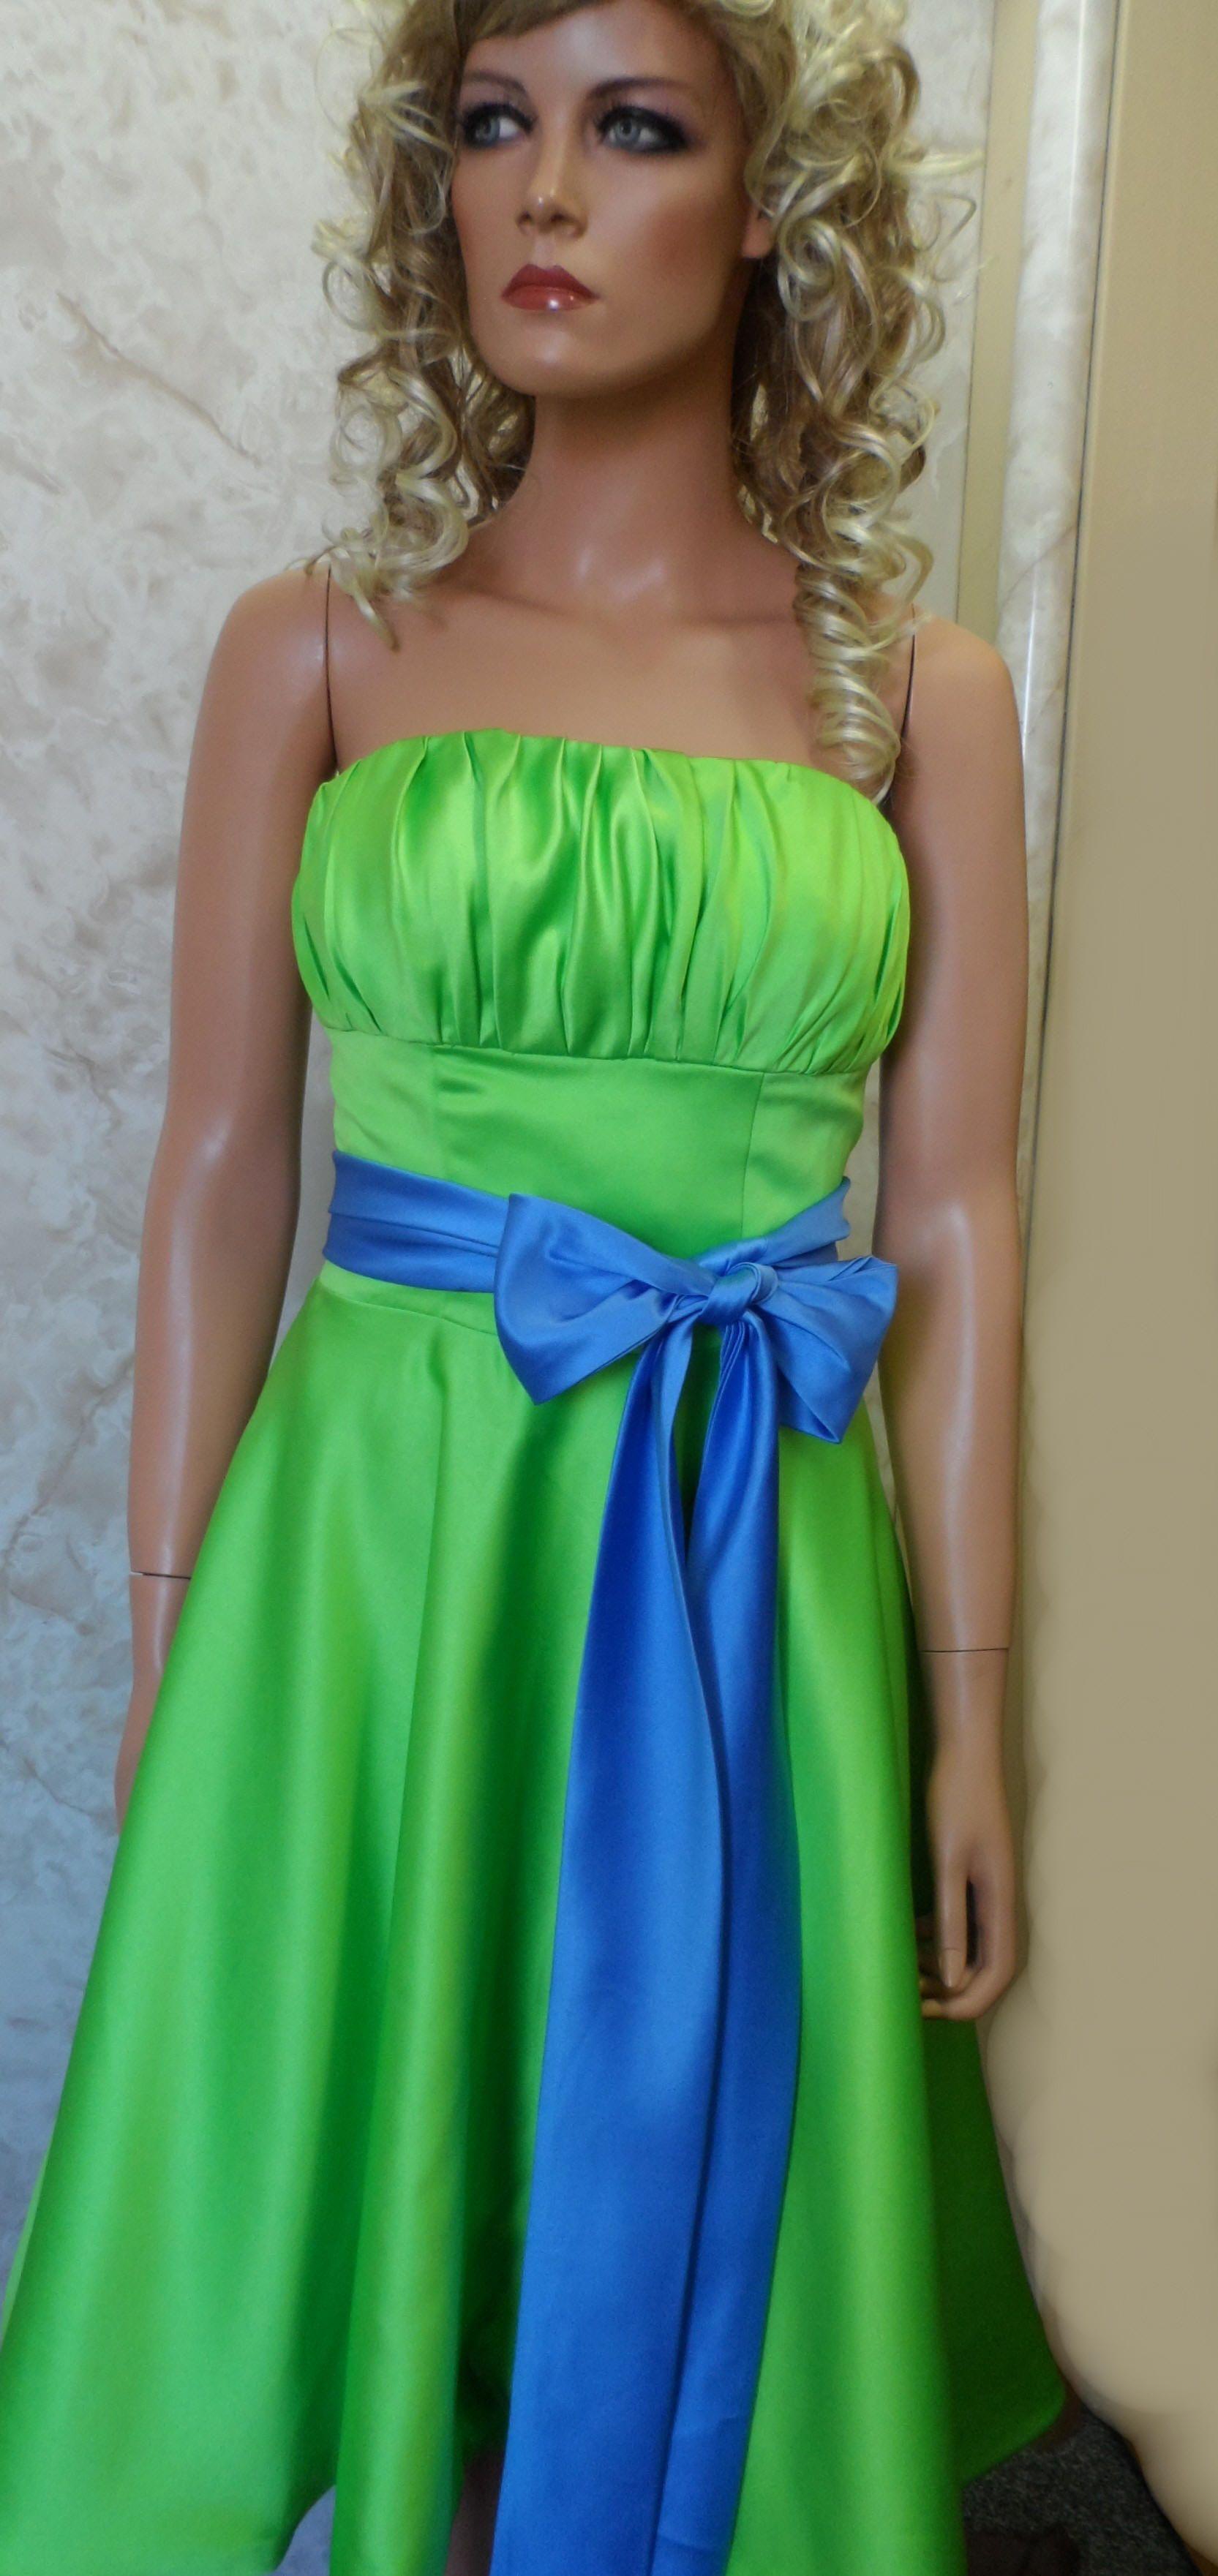 Bridesmade dress blue bridesmaid dress with black sash 2084 bridesmade dress blue bridesmaid dress with black sash 2084 jaks bridesmaid dresses ombrellifo Gallery